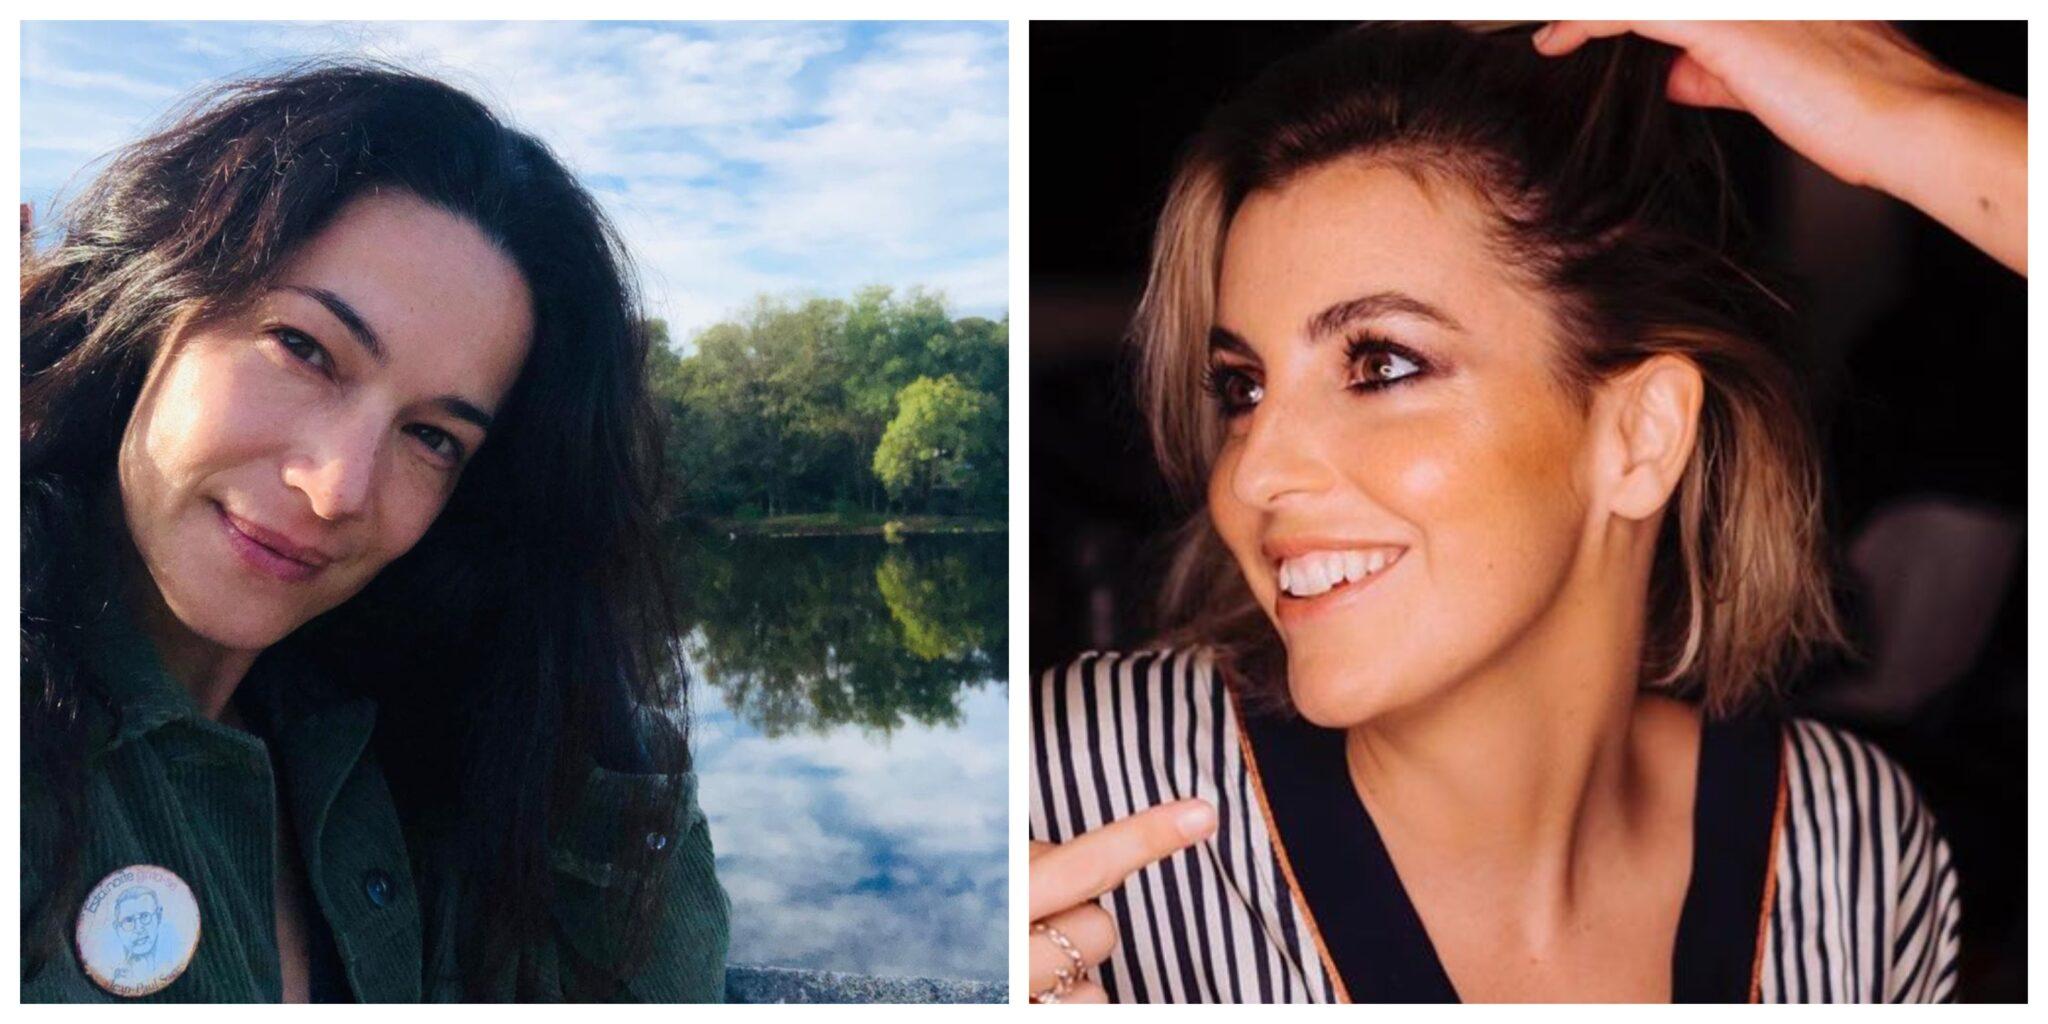 Paula Neves E Jessica Athayde Scaled Paula Neves E Jessica Athayde Beijam-Se Na Boca E Diogo Amaral Reage